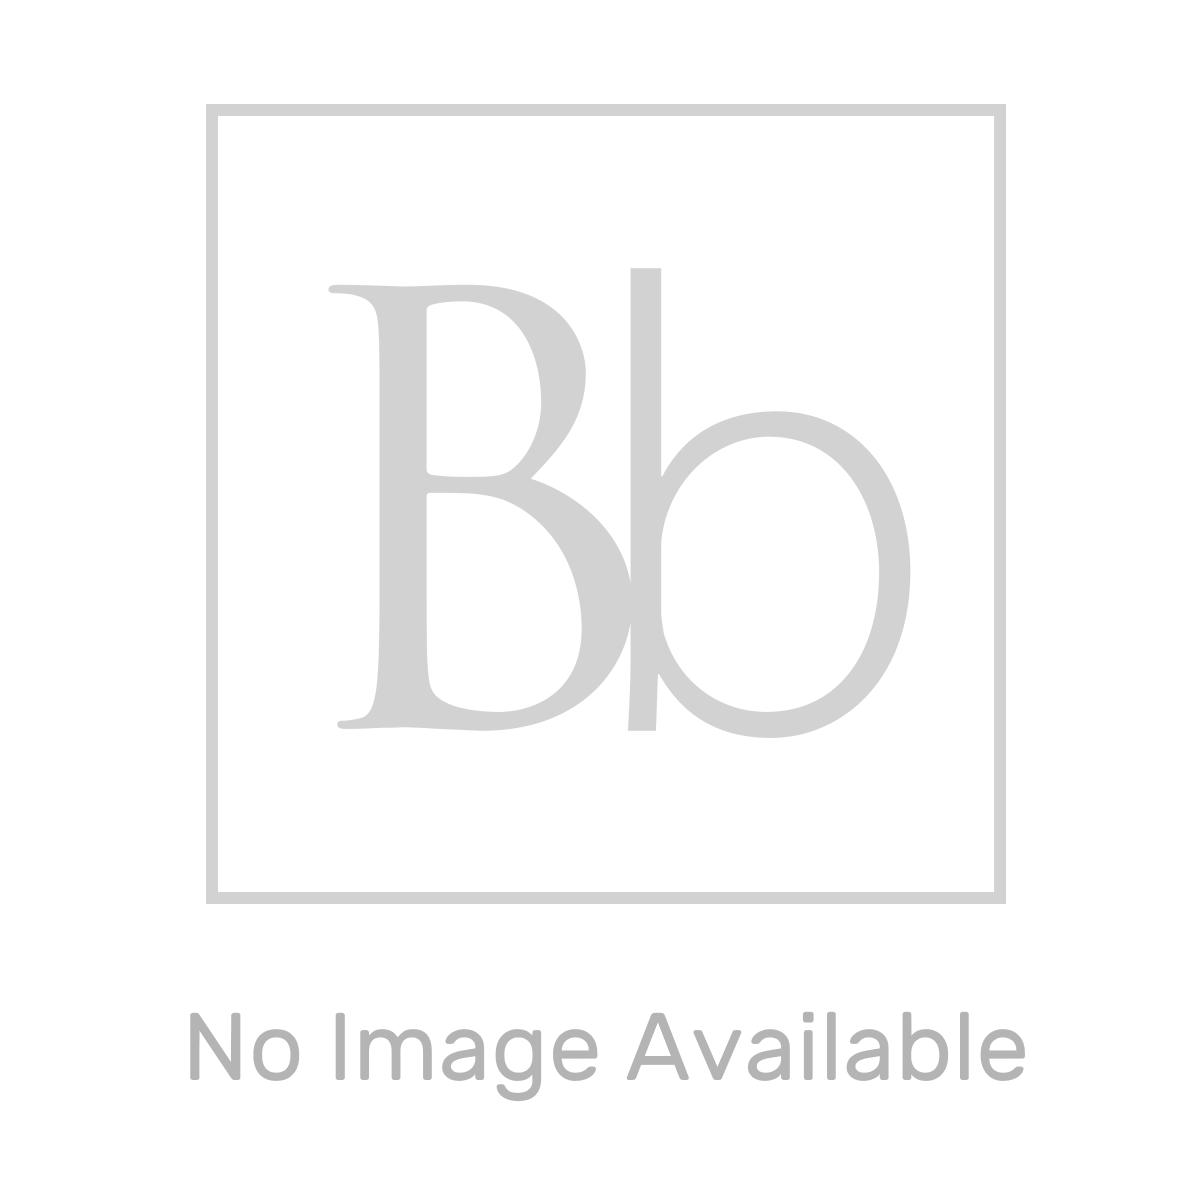 RAK Sensation Maxi Wall Hung Toilet with Soft Close Seat Measurements